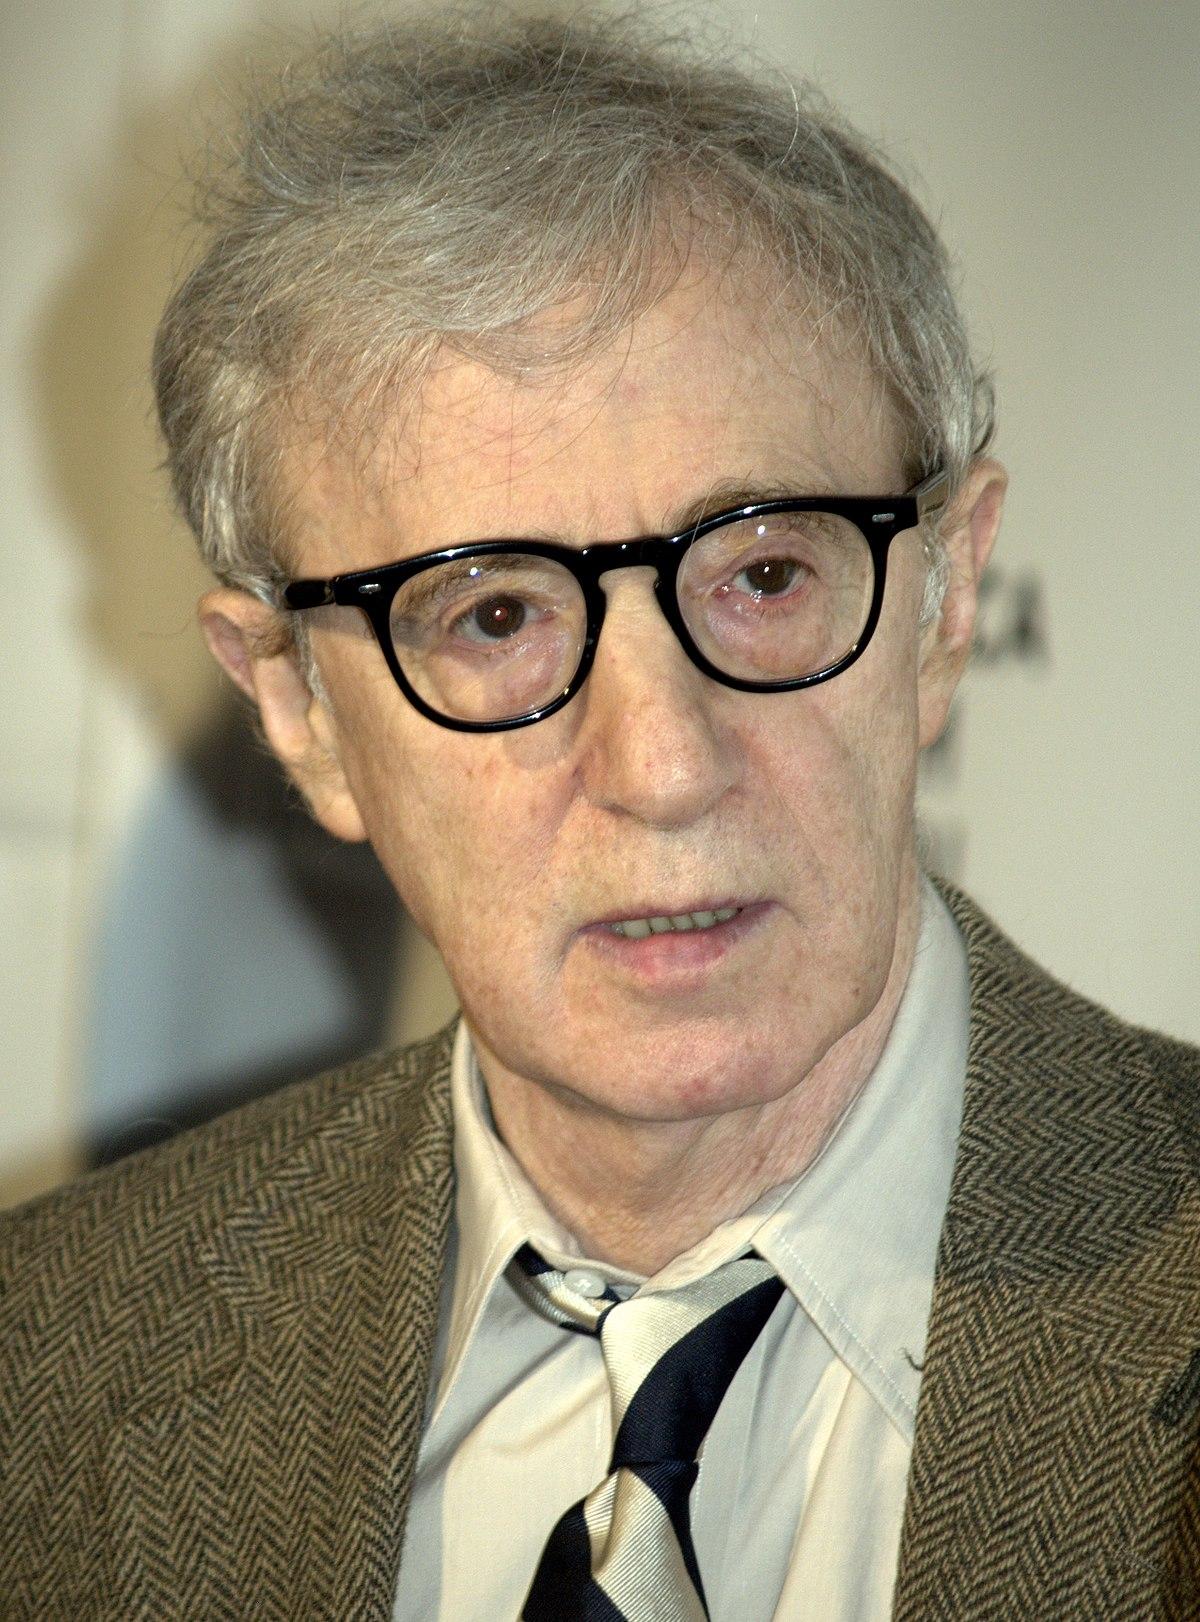 Woody Allen - Wikiquote